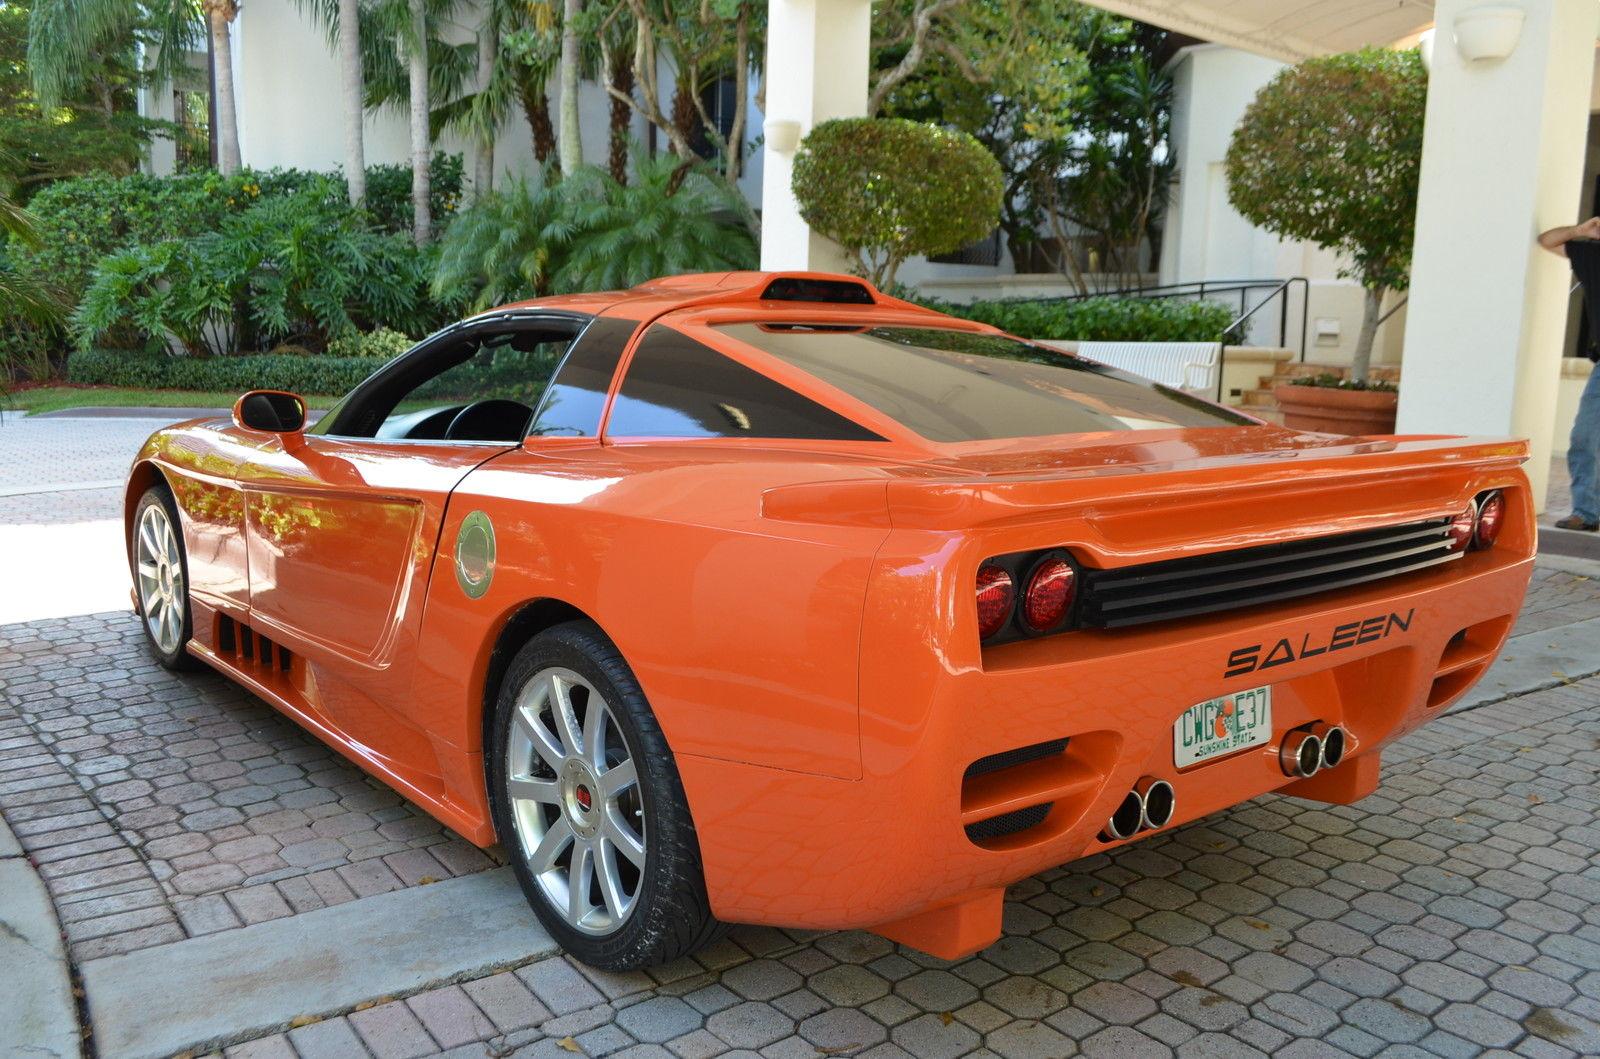 Saleen S7 For Sale >> BangShift.com Saleen S7 Corvette